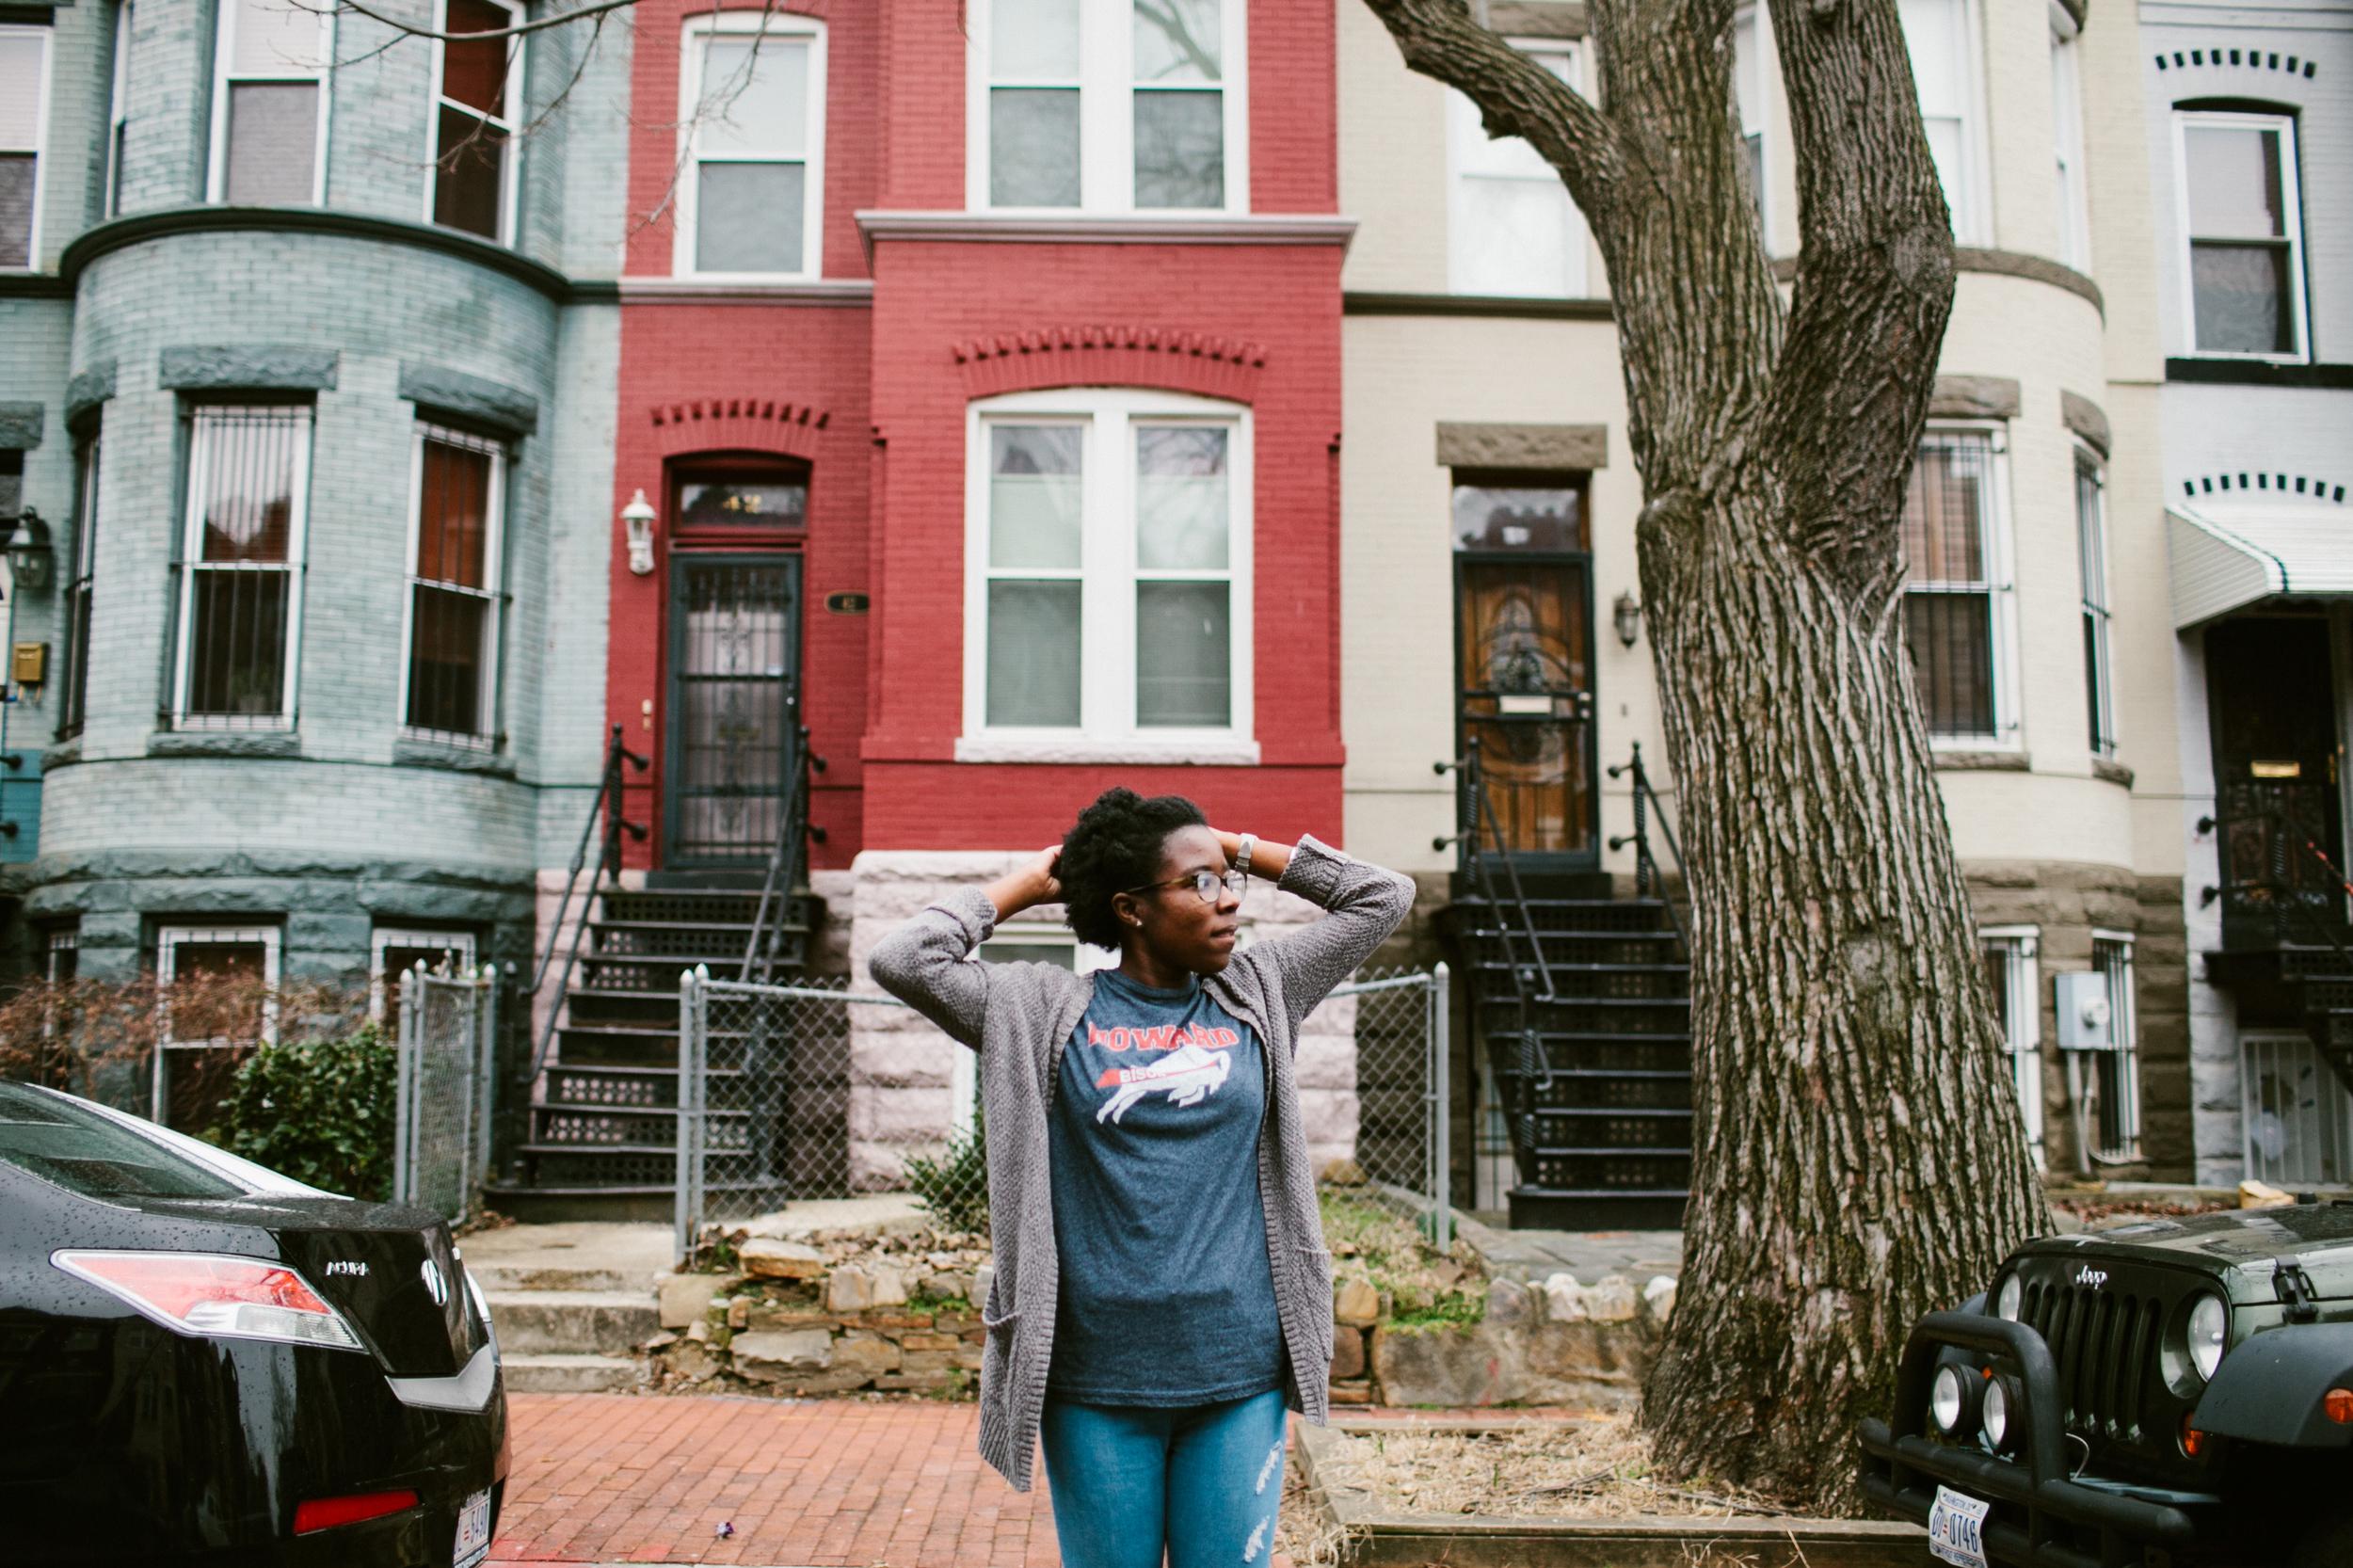 Amira | Washington D.C. Portraits by Ellie Be